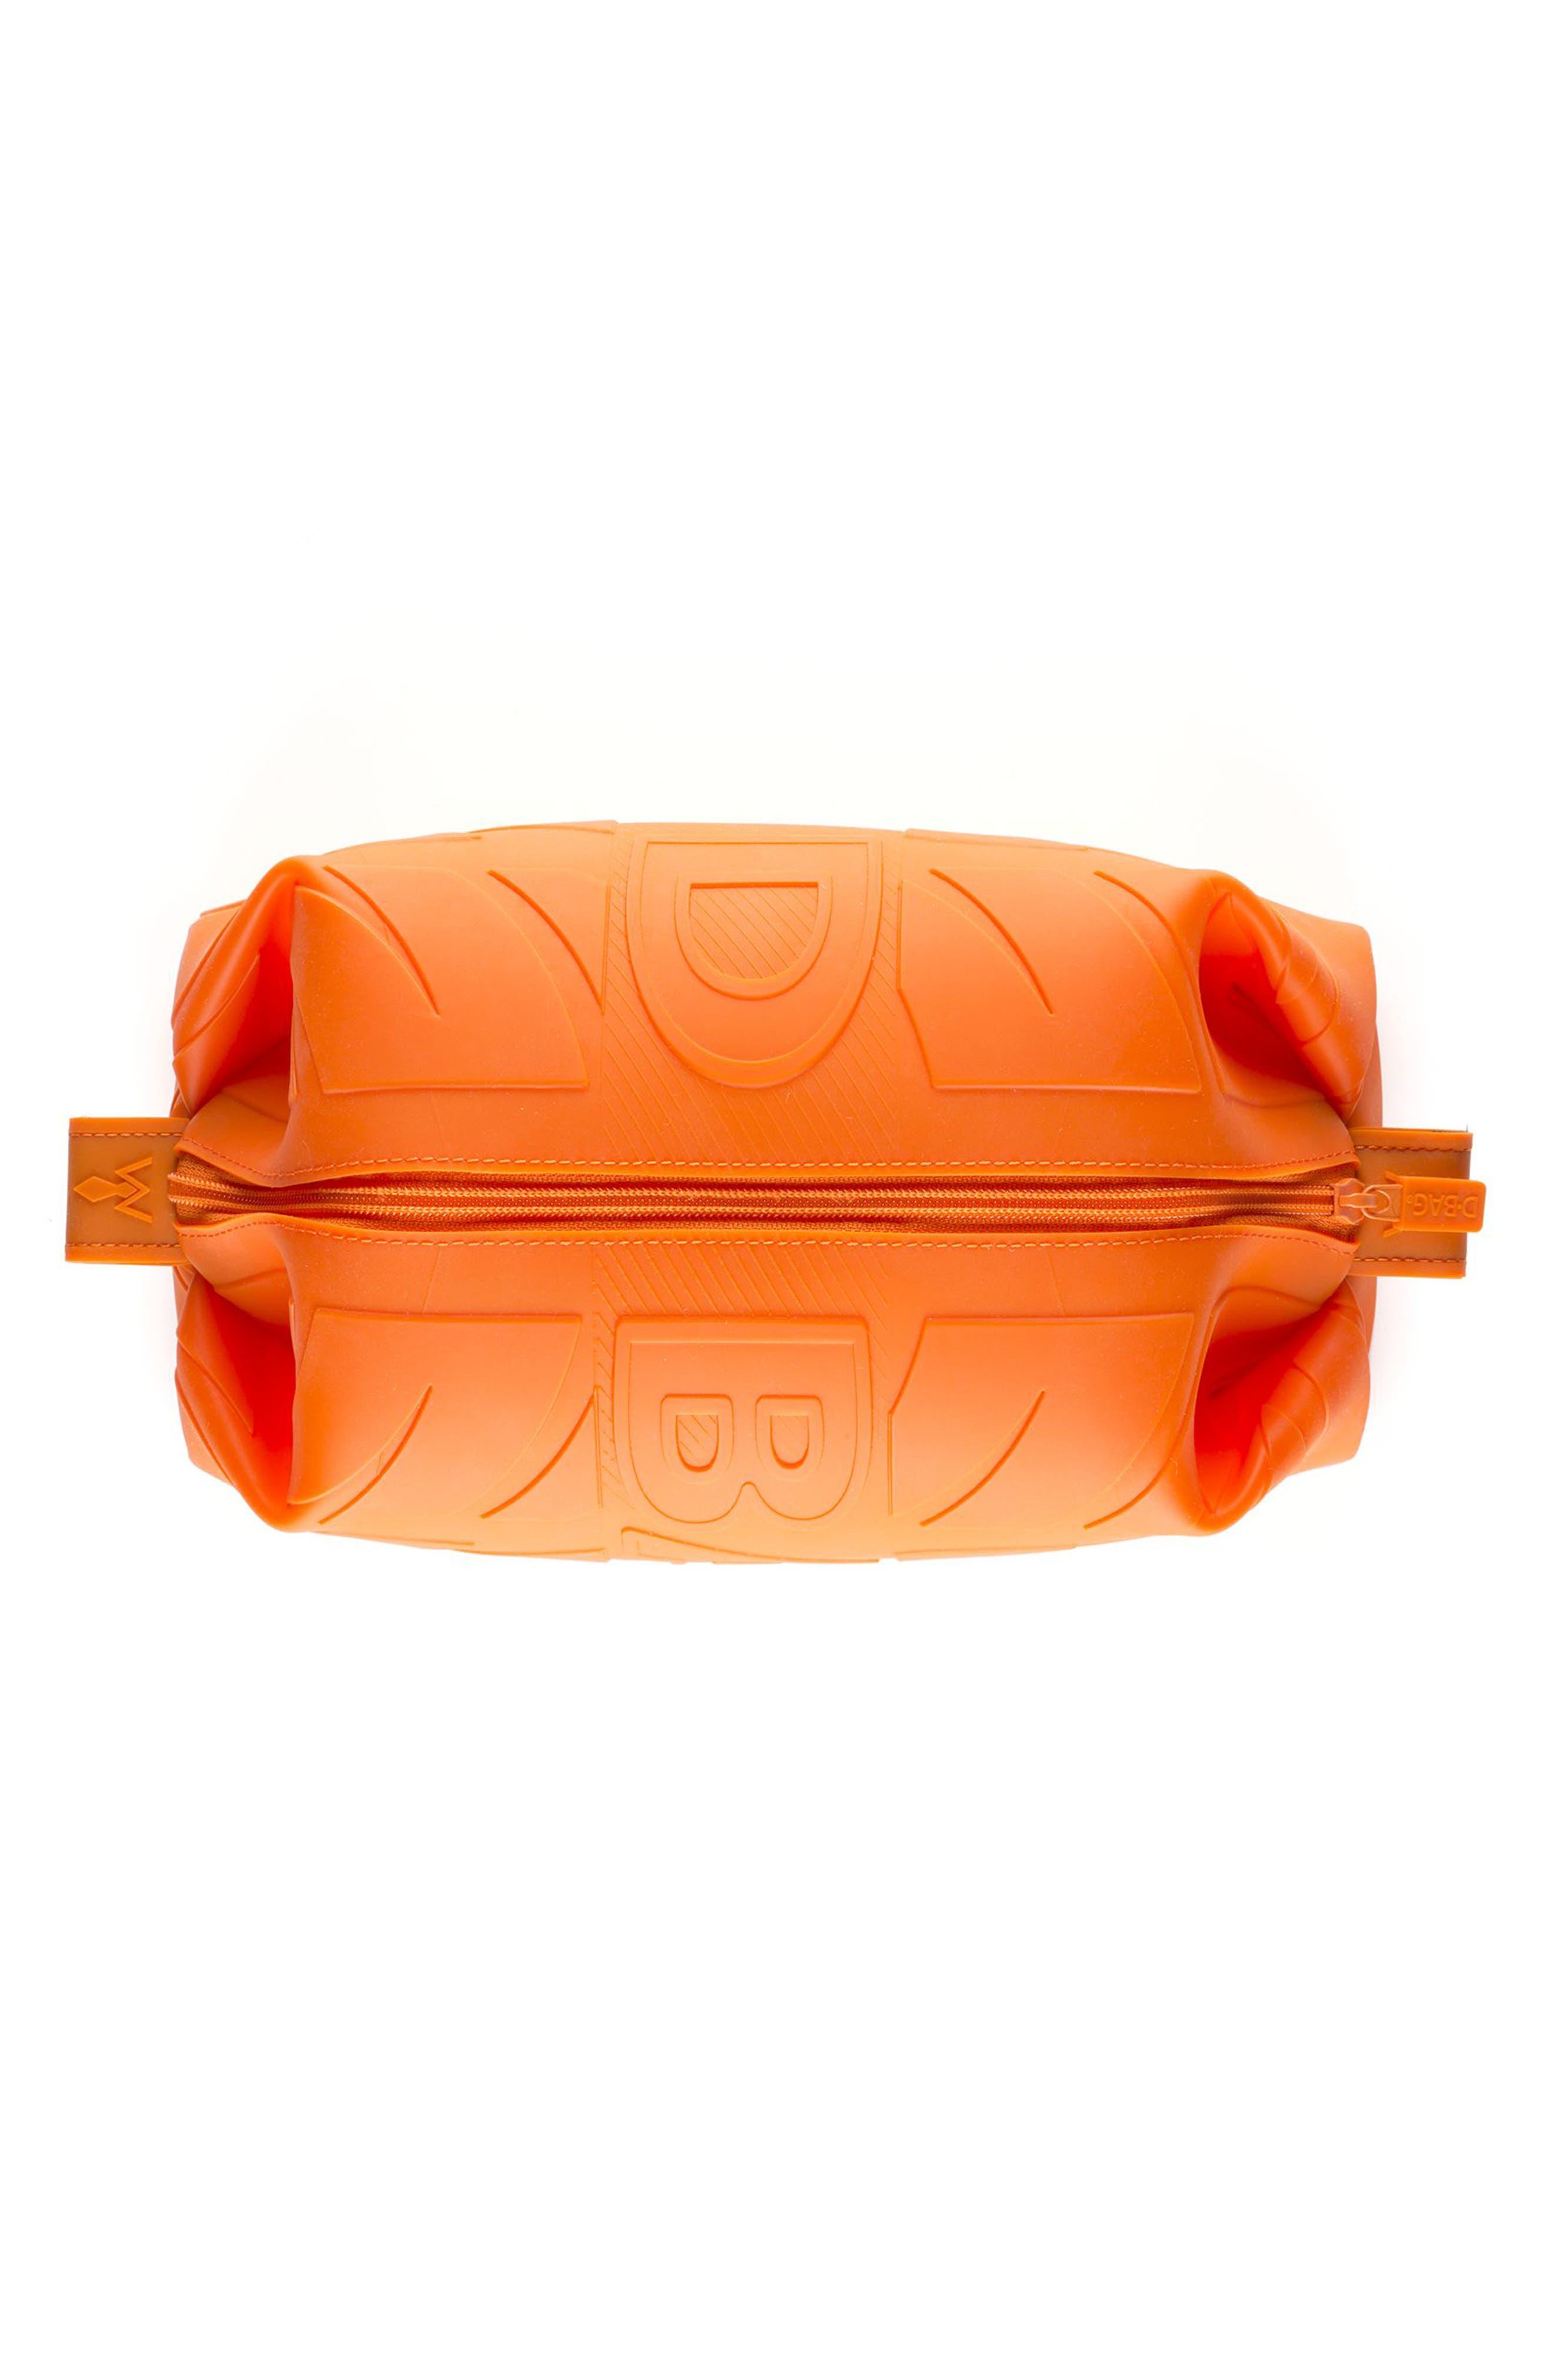 Silicone Travel Kit,                             Alternate thumbnail 2, color,                             Orange